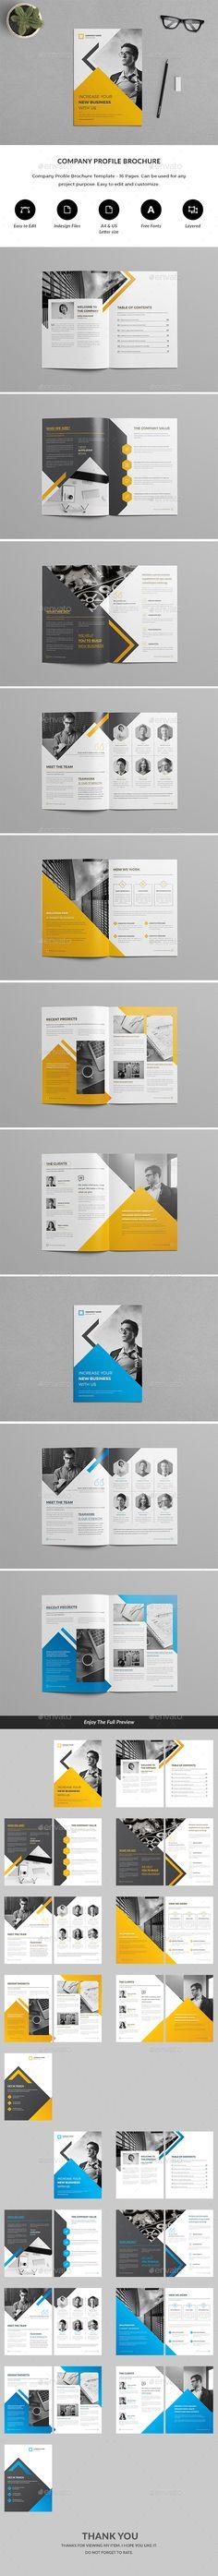 Company Profile Brochure — InDesign INDD #startup #case study • Download ➝ https://graphicriver.net/item/company-profile-brochure/20388298?ref=pxcr